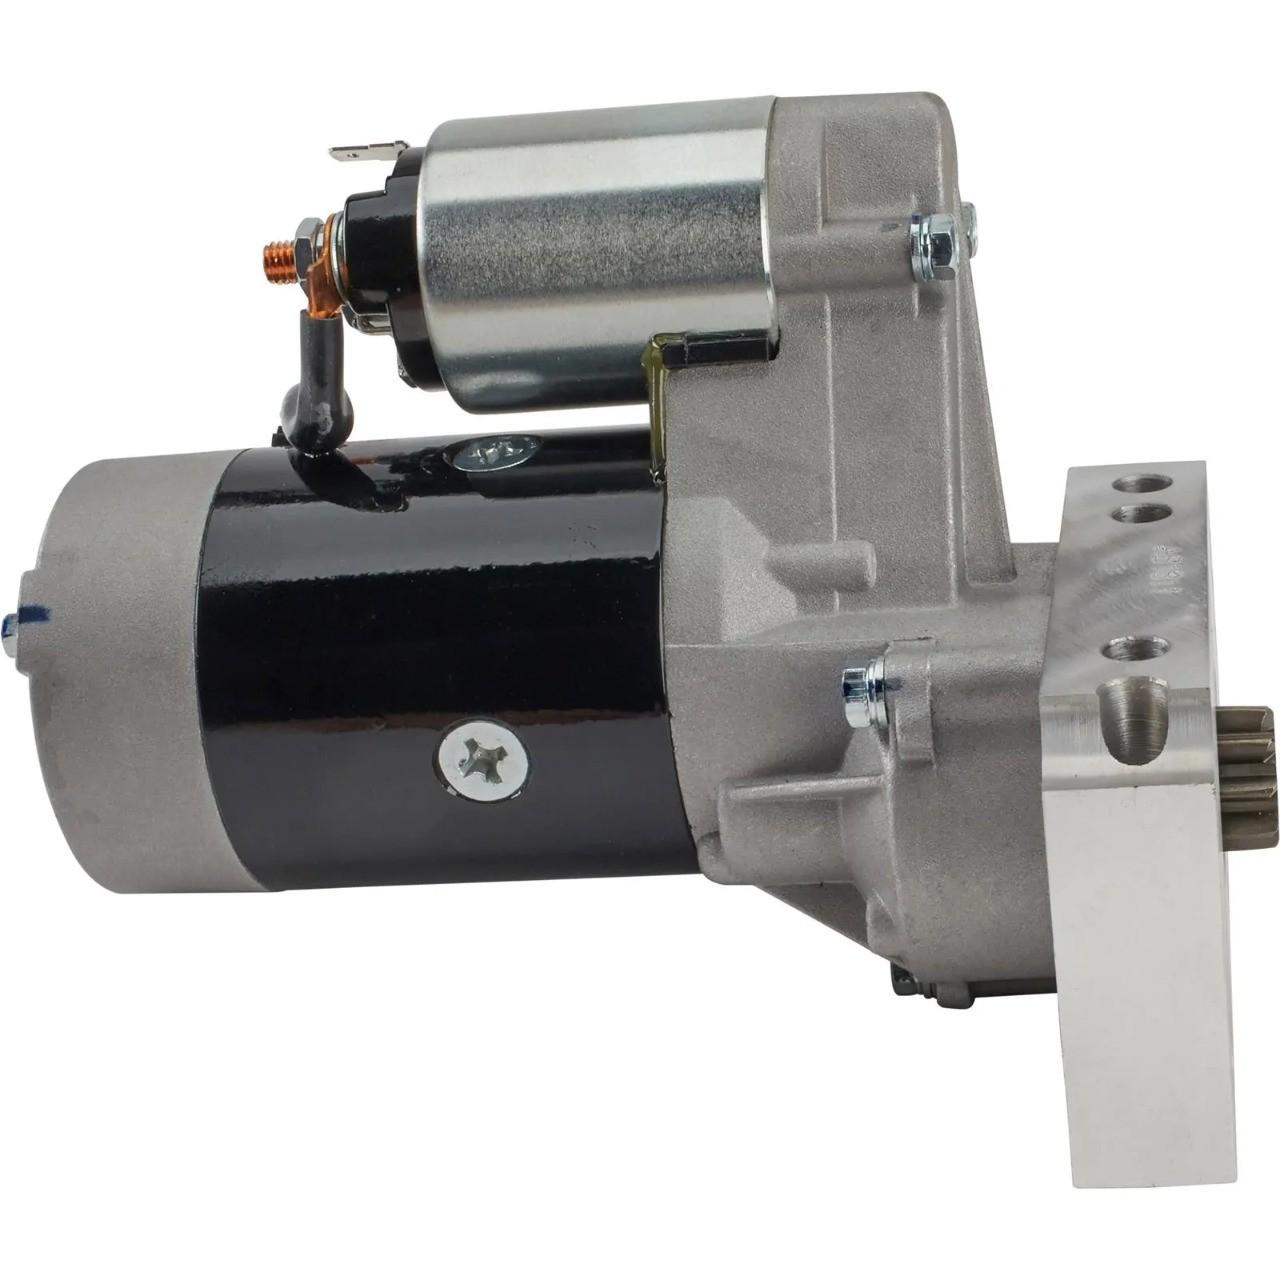 Motor Arranque Alto Torque Chevrolet 6 cilindros / V8 - Small Block / Big Block - CHM  - PRO-1 Serious Performance